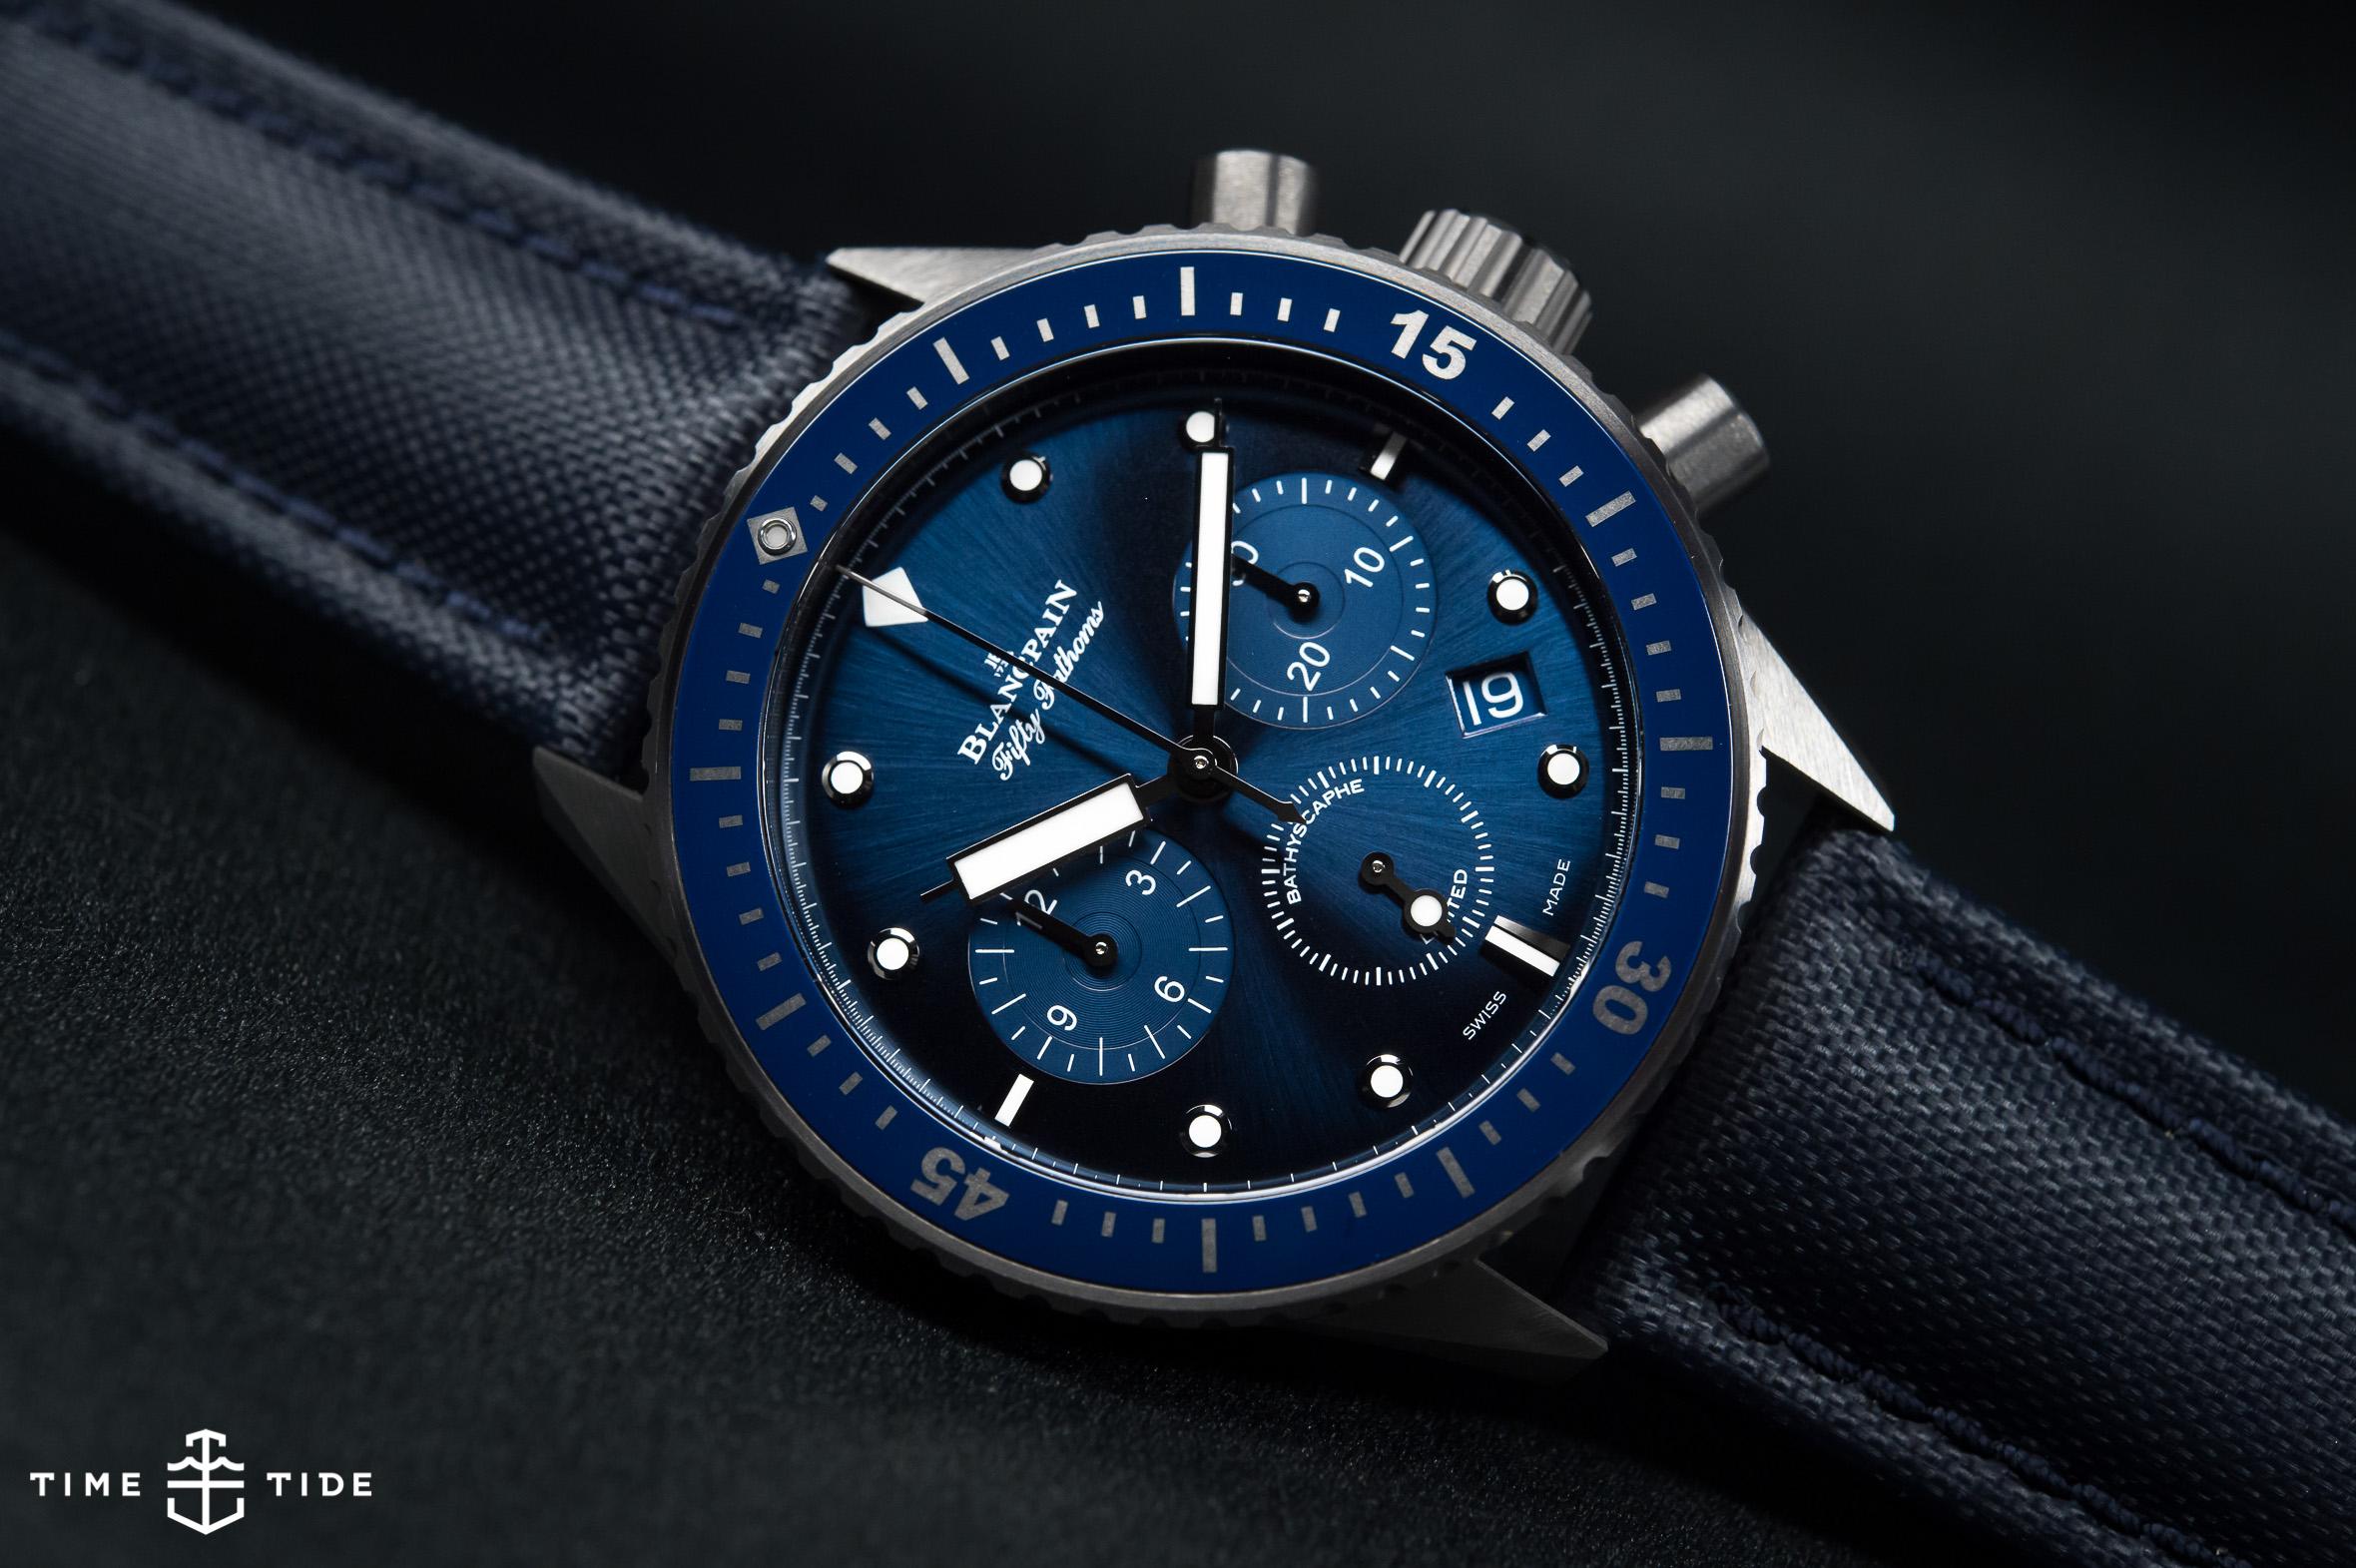 Blancpain Ocean Commitment Bathyscaphe Flyback Chronograph -1